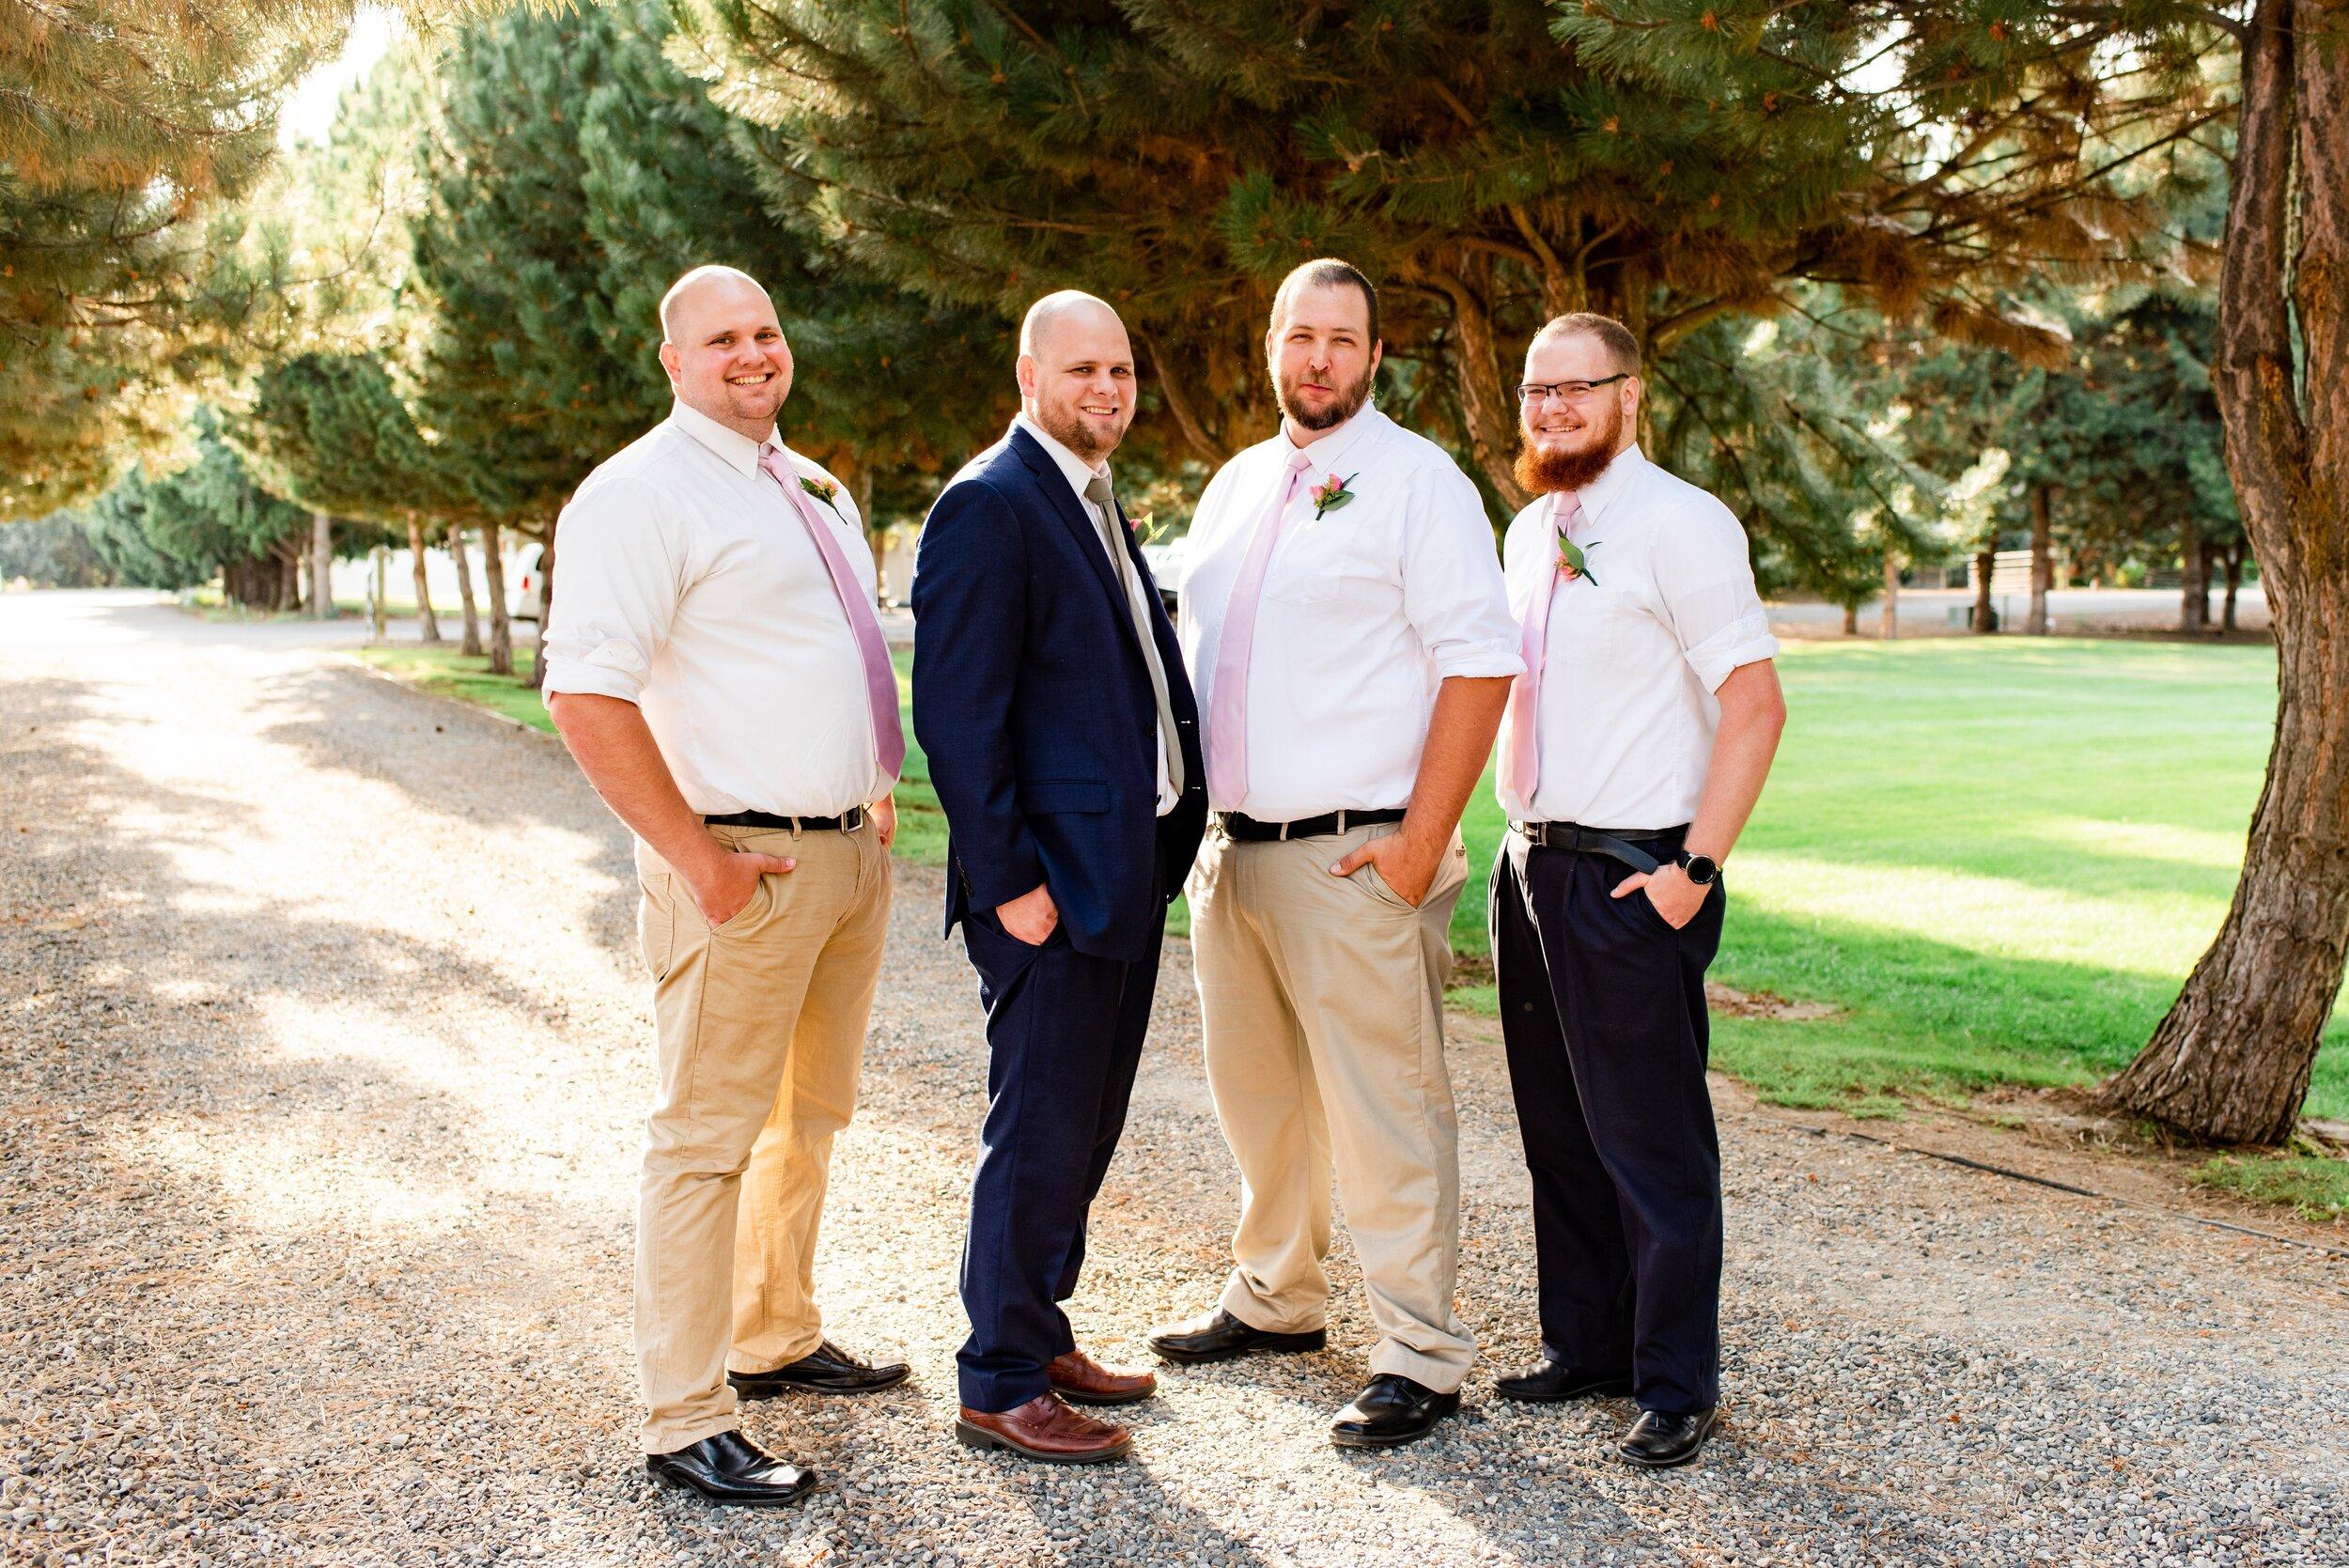 Groom & Groomsmen - Tri Cities Wedding Photographer - Morgan Tayler Photo & Design - Tri Cities Washington Backyard Wedding